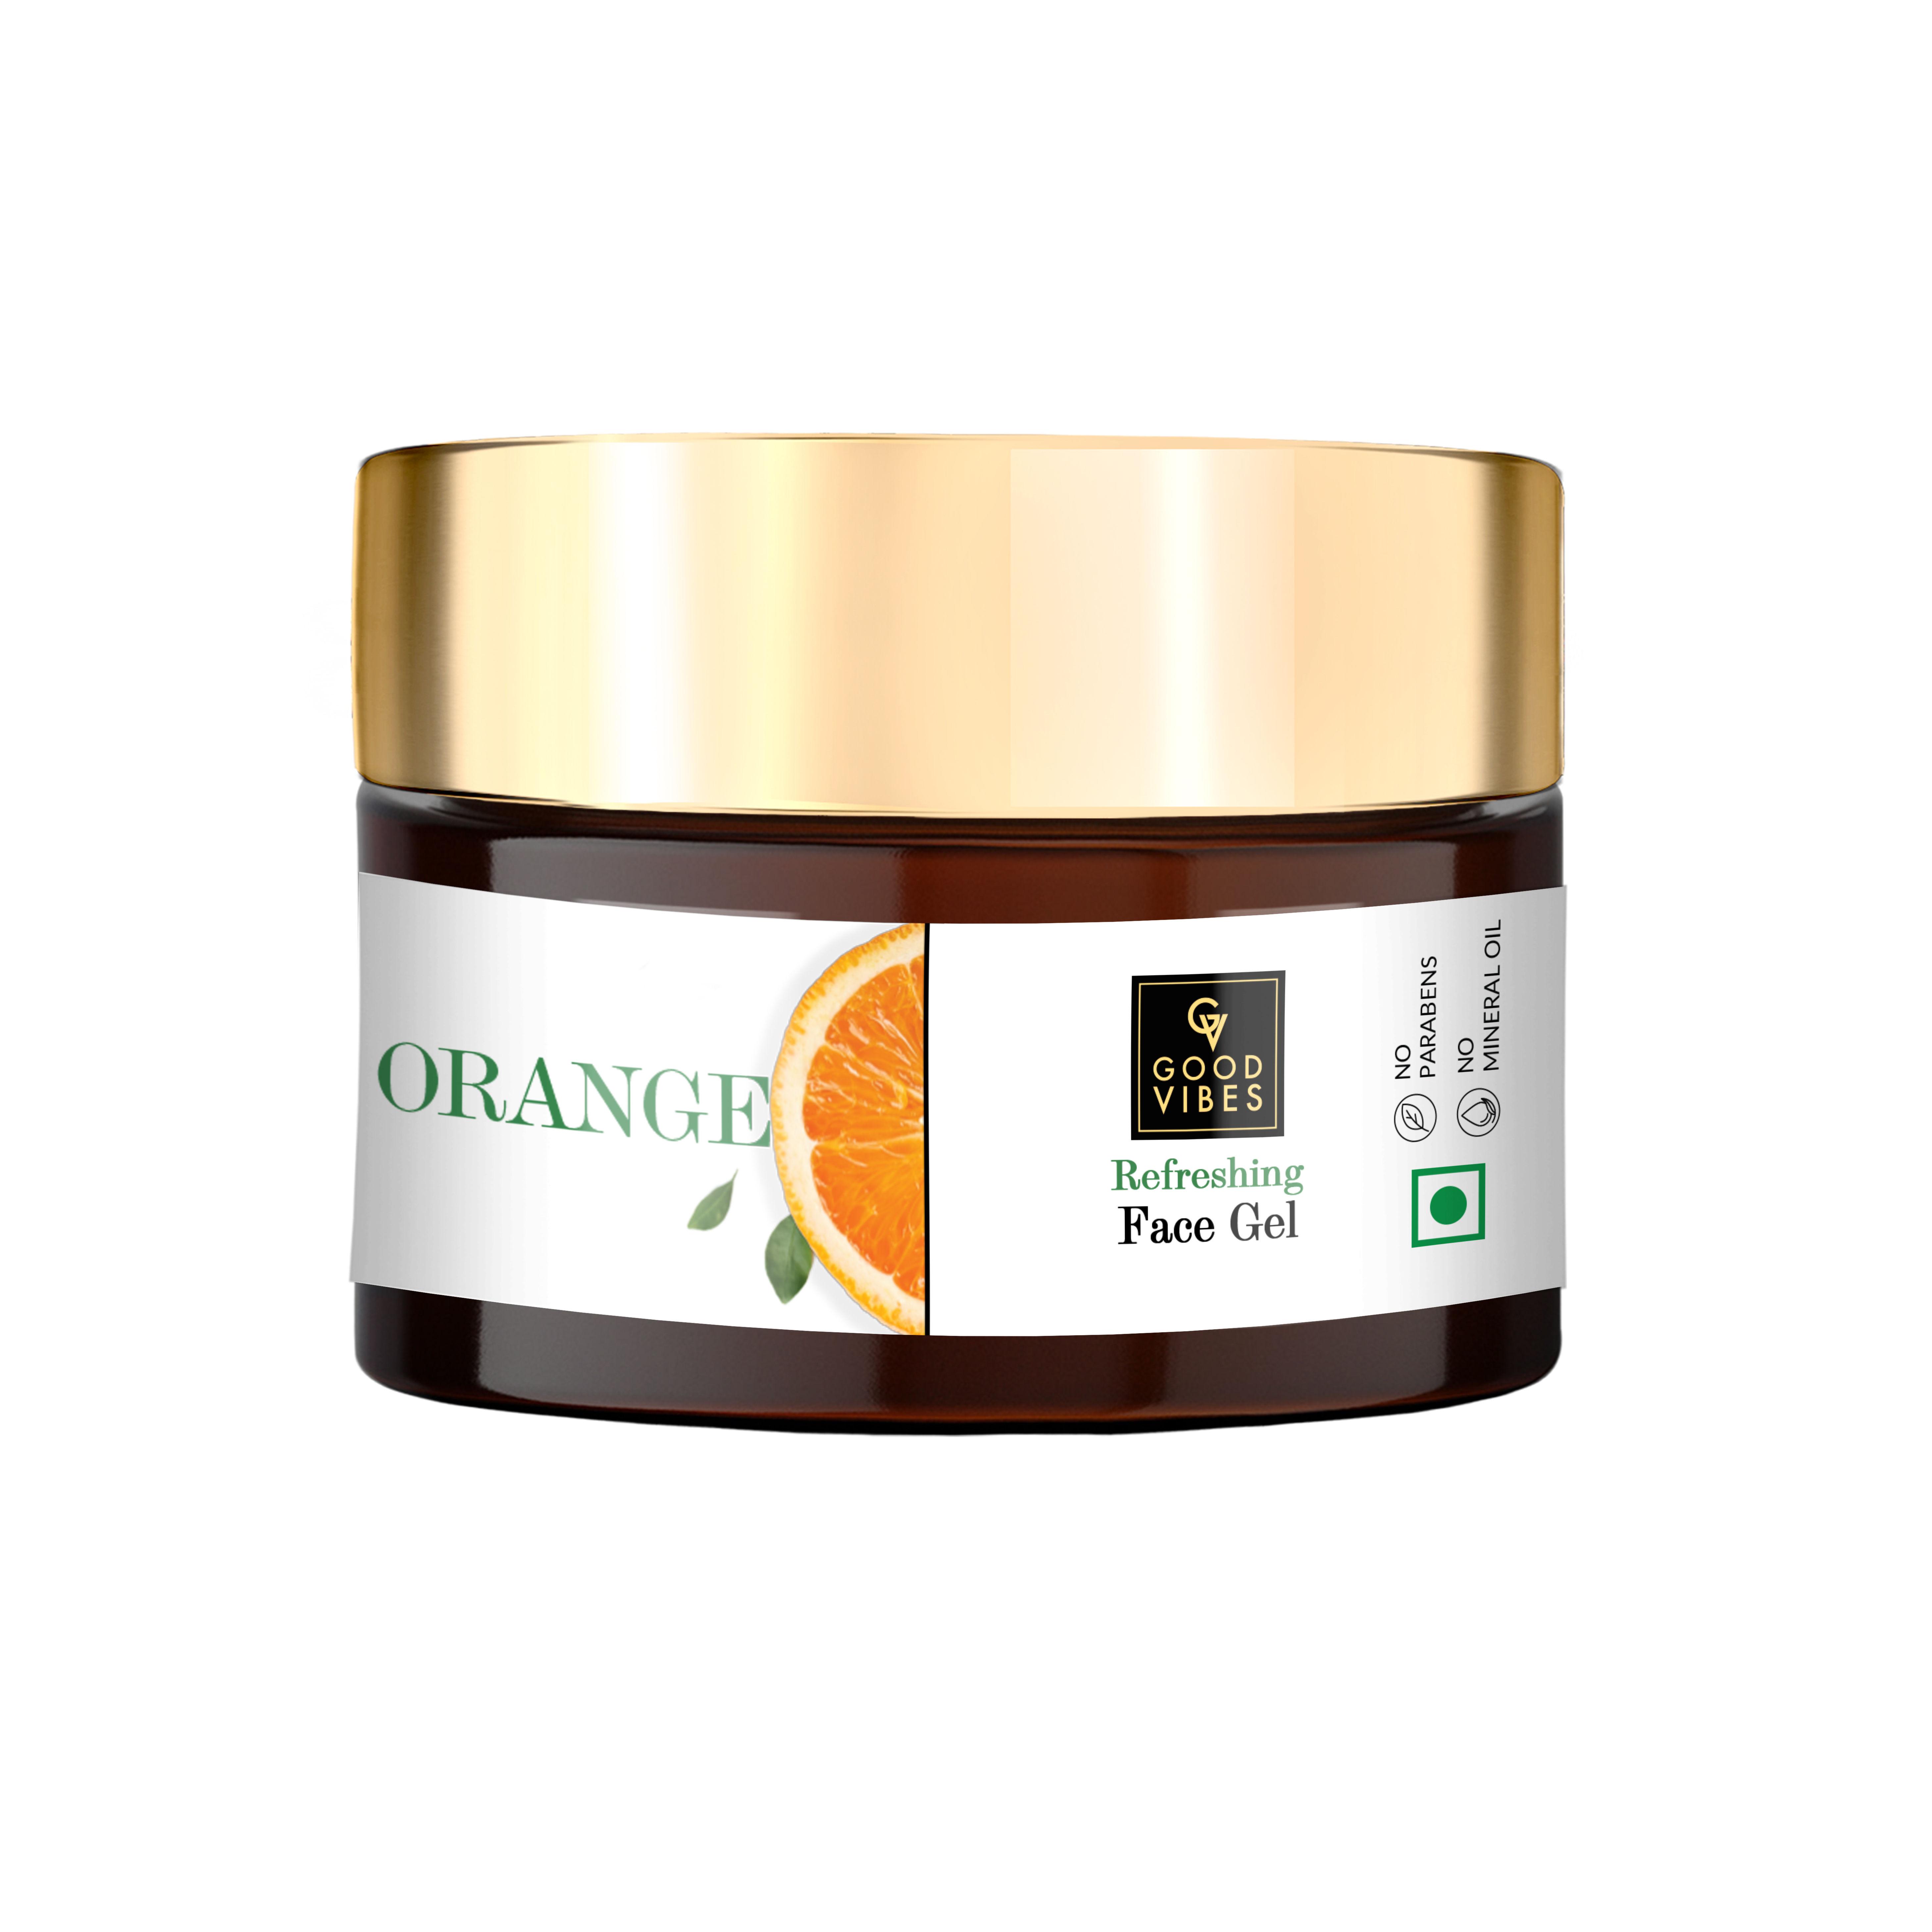 Good Vibes | Good Vibes Gel - Orange (50 g)